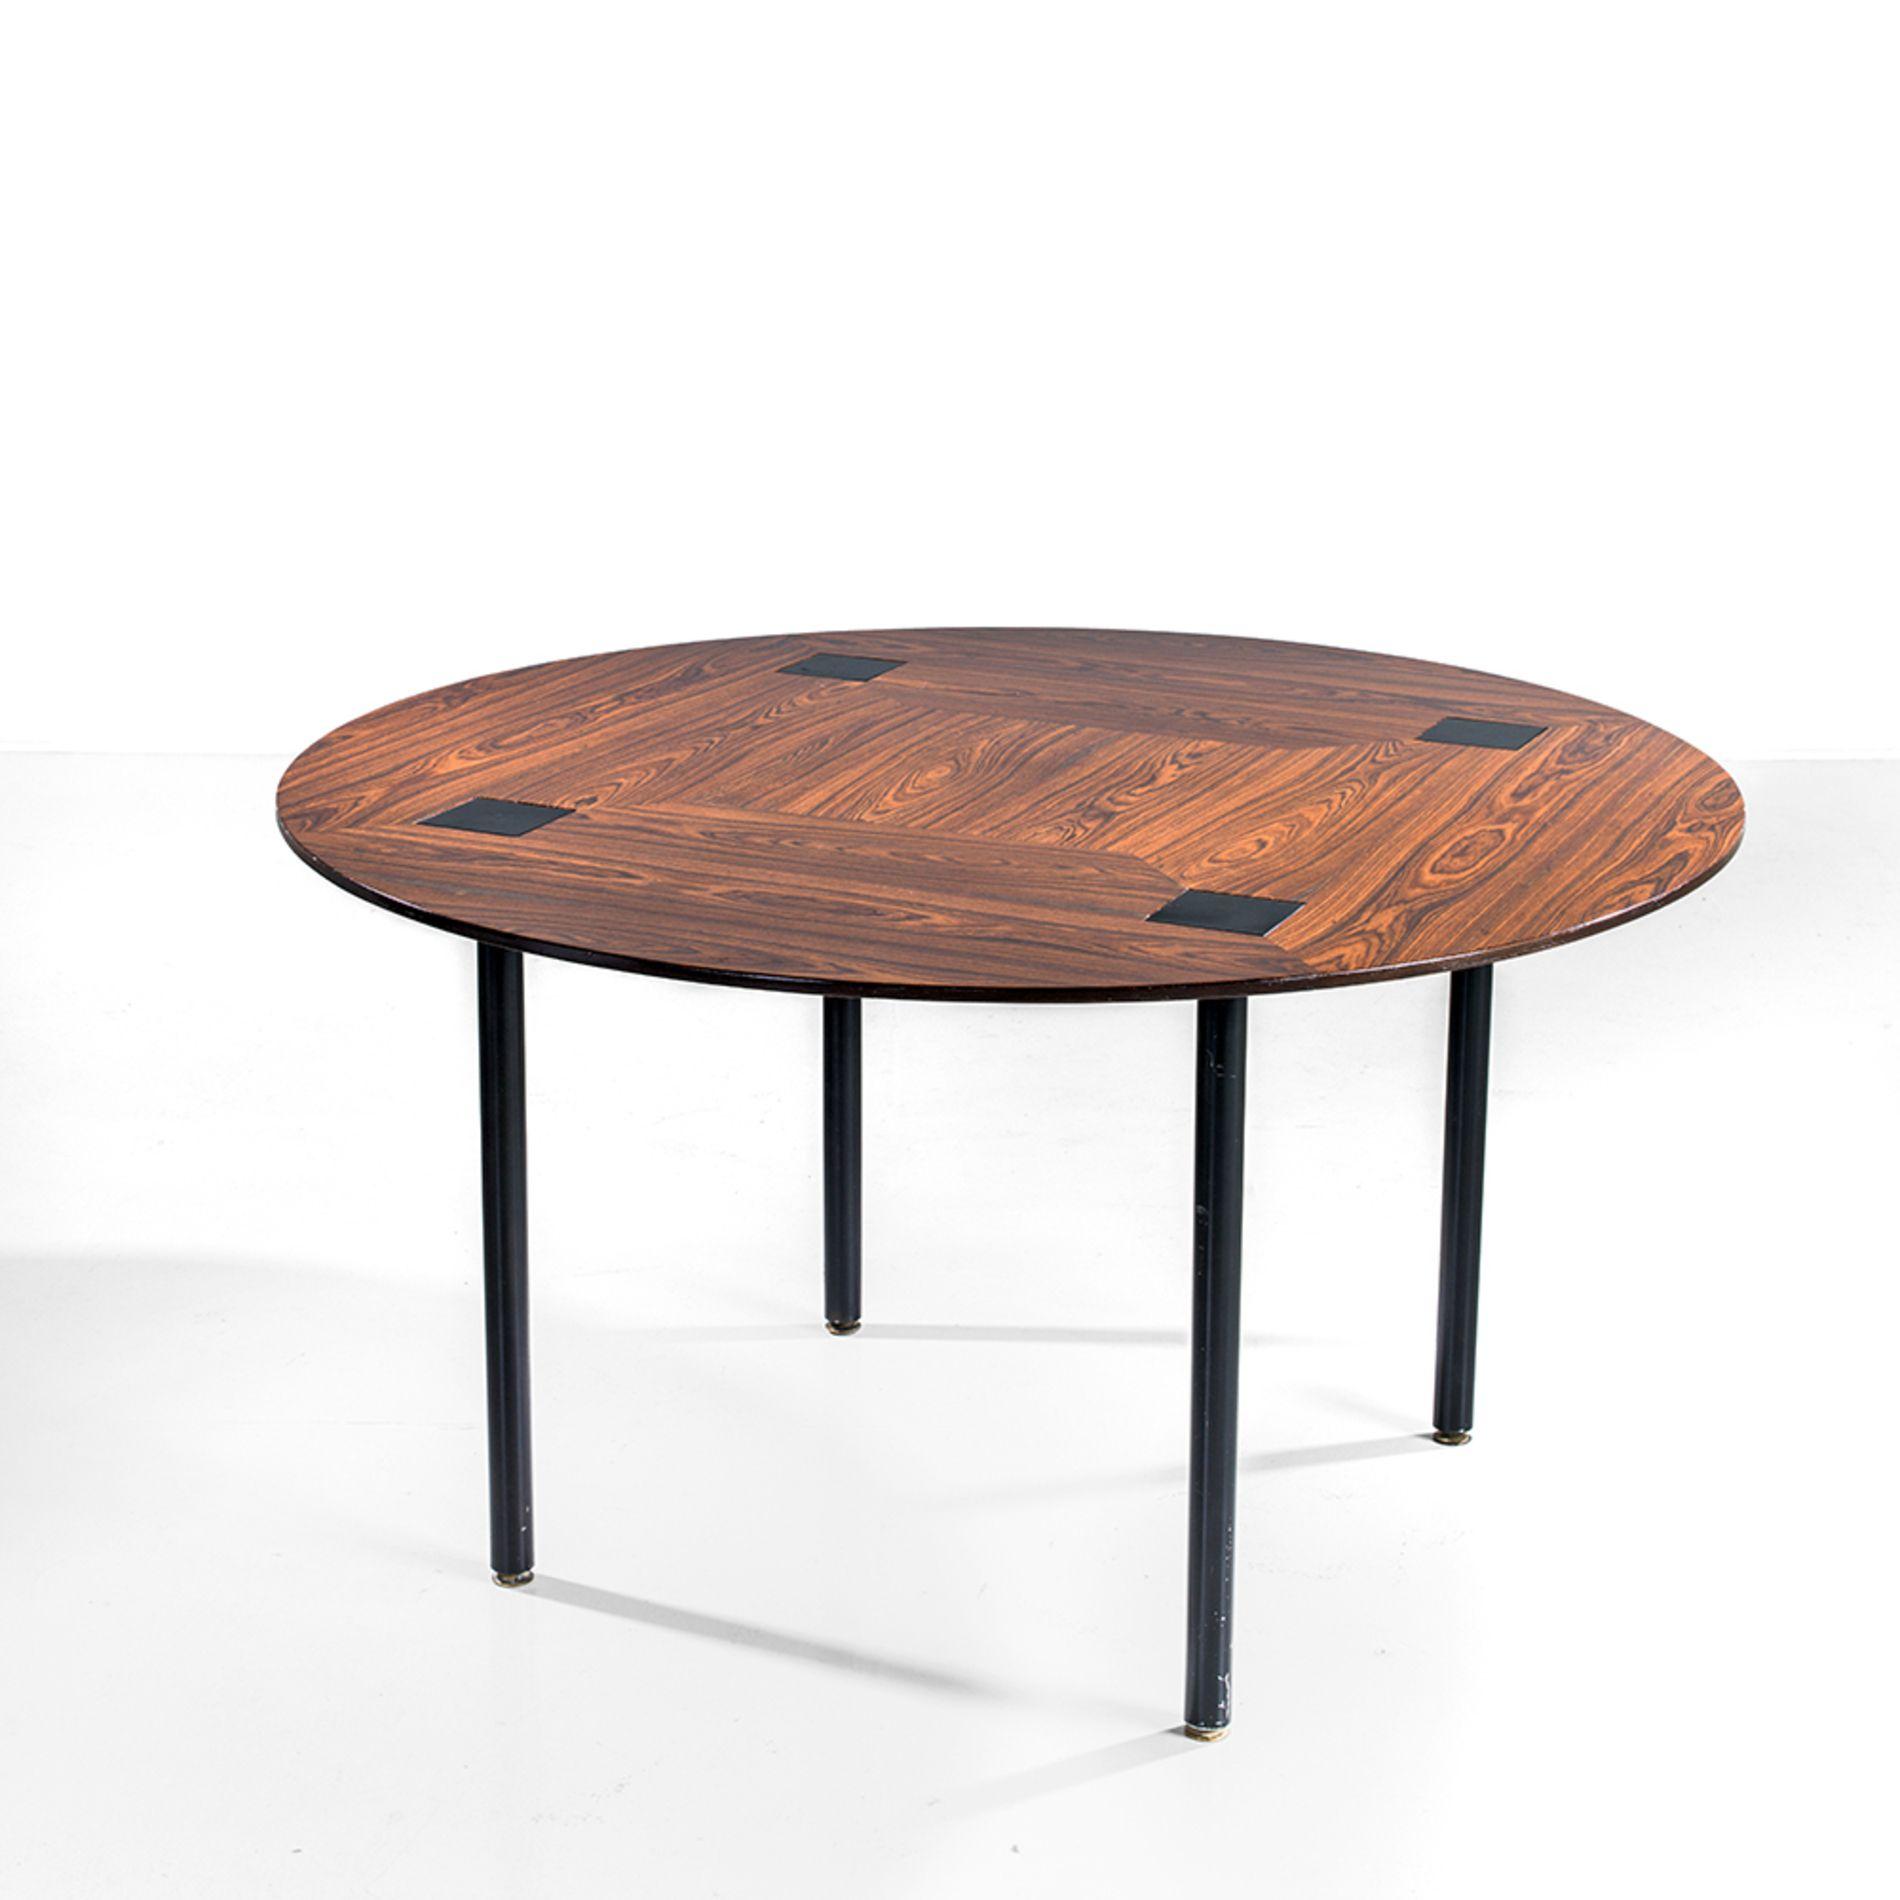 Ettore Sottsass 1917 2007 Table de salle  manger Bois et métal